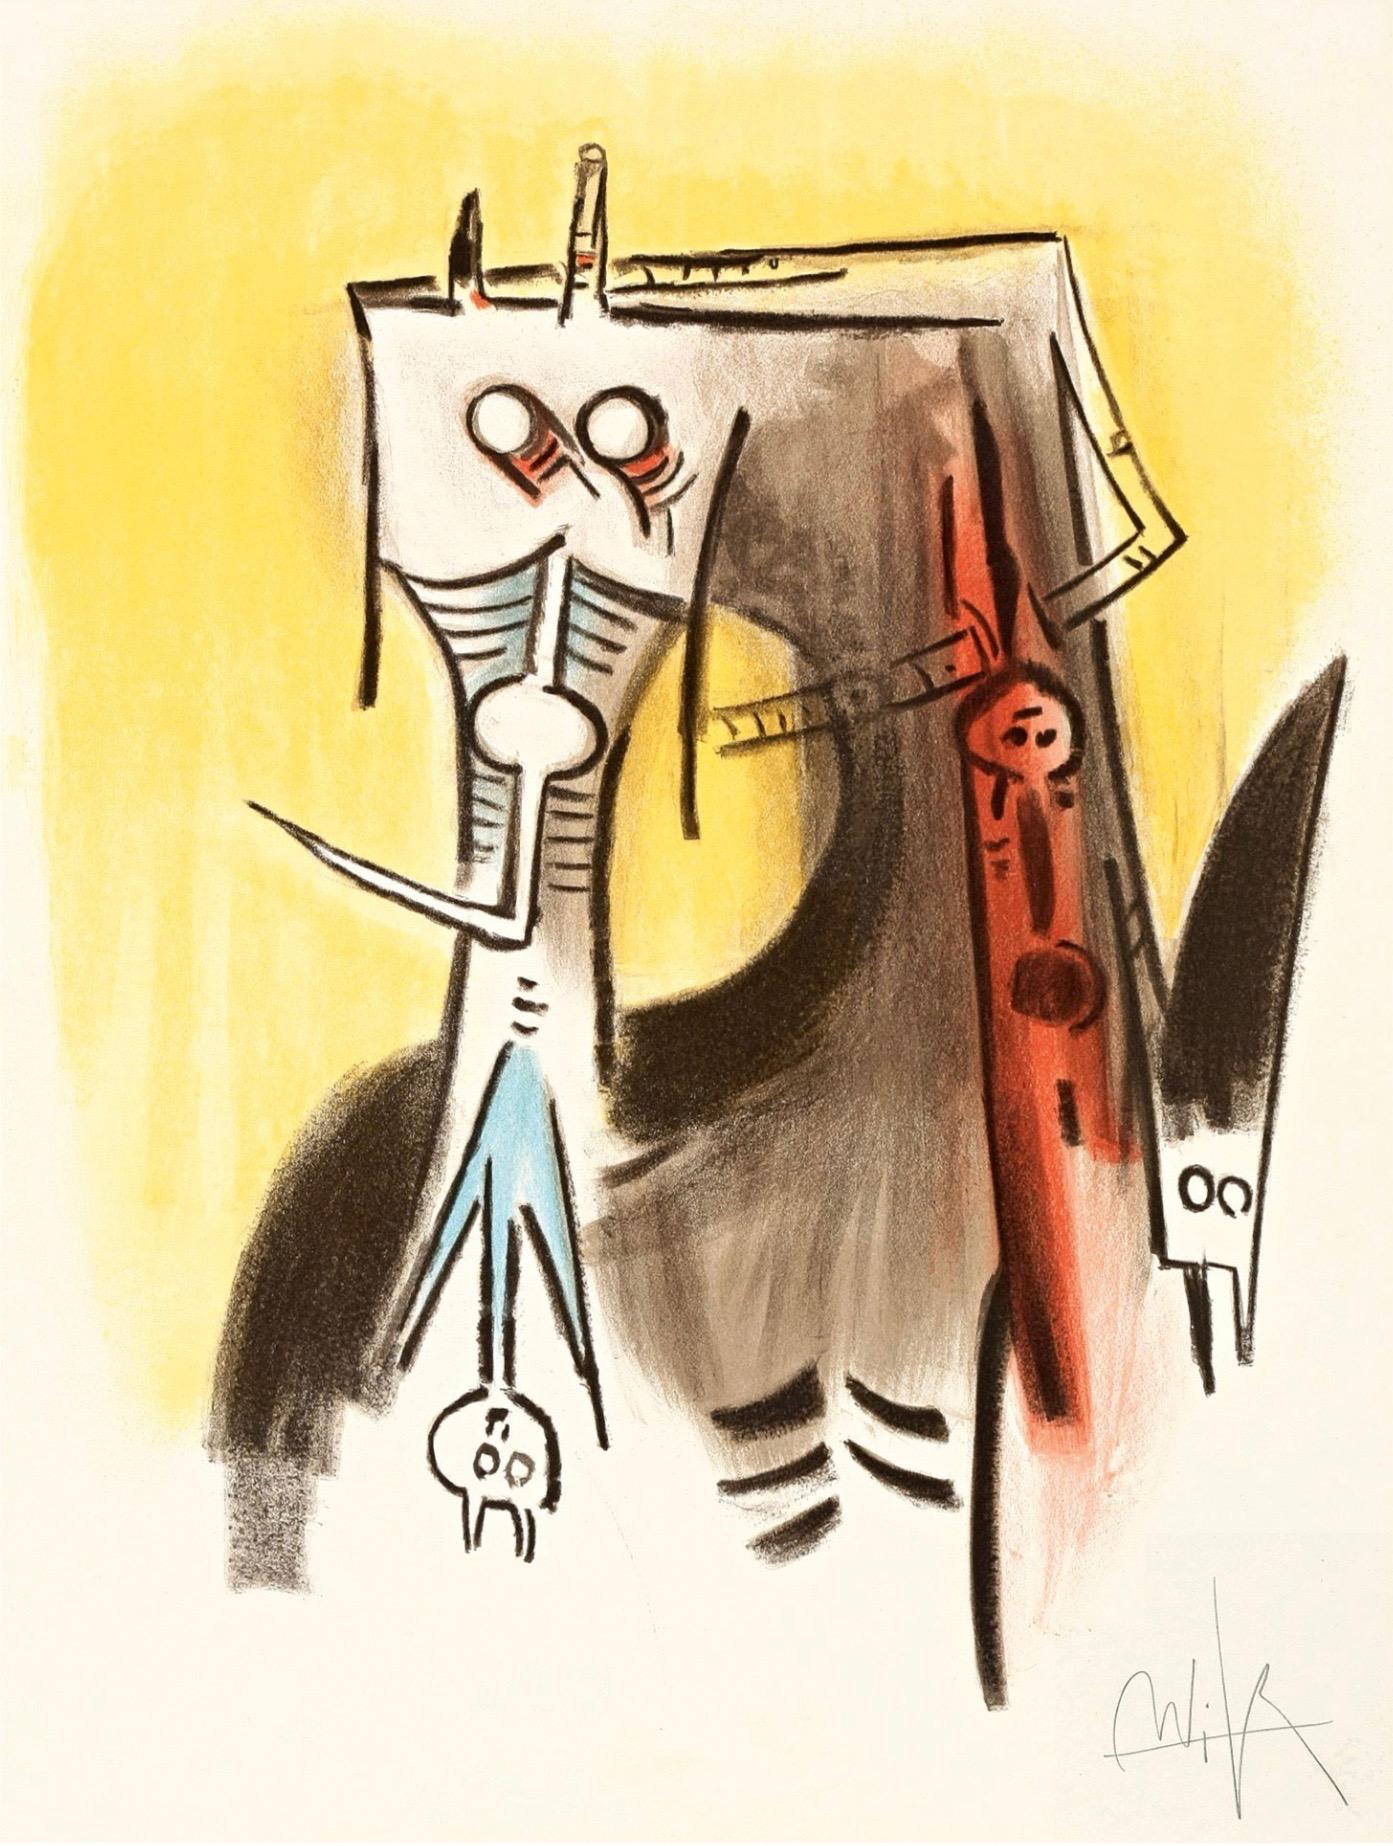 Le Regard Vertical #1 by Wifredo Lam